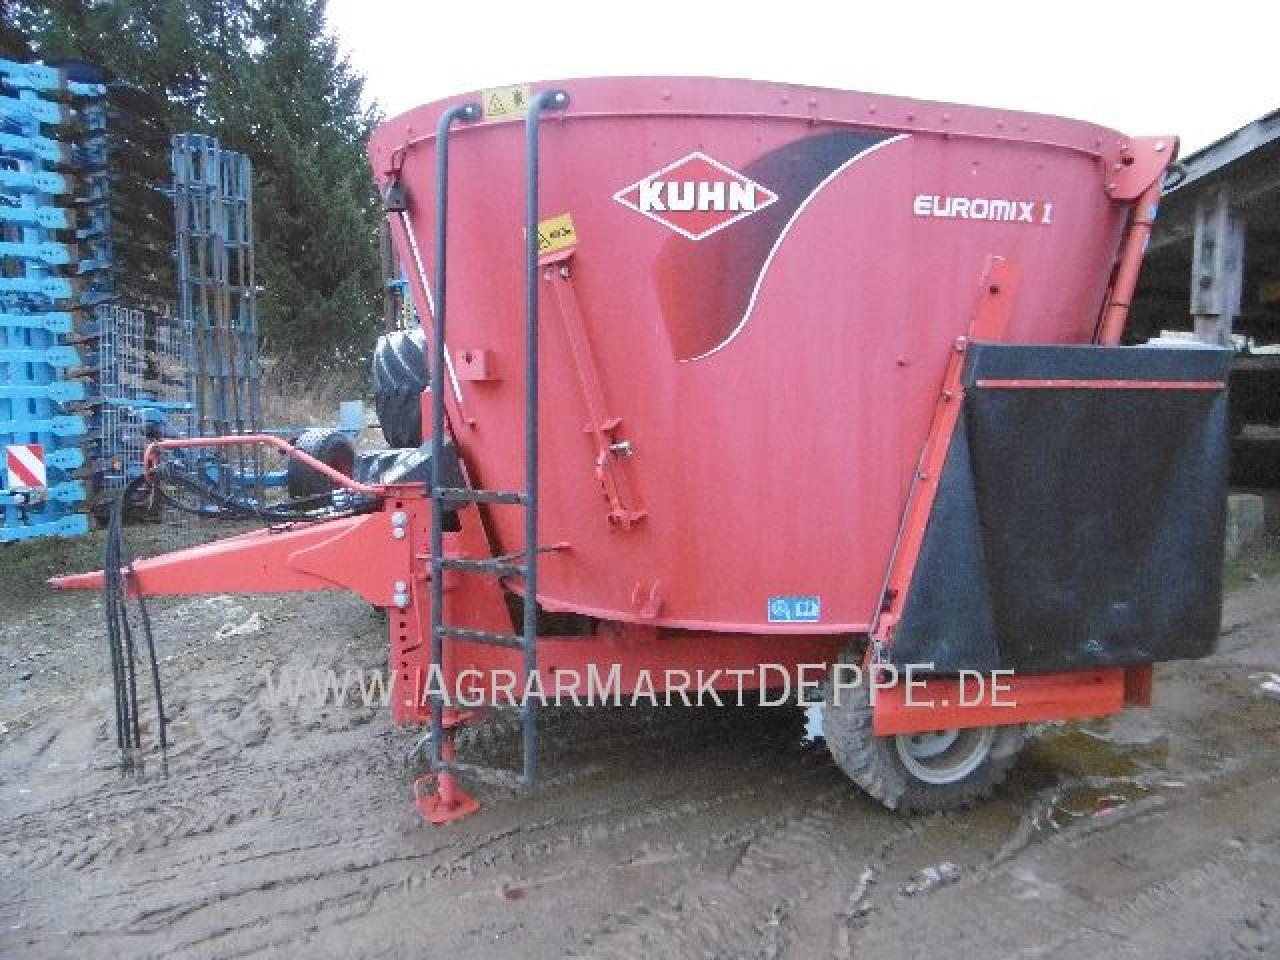 Kuhn Euromix I 870 Select